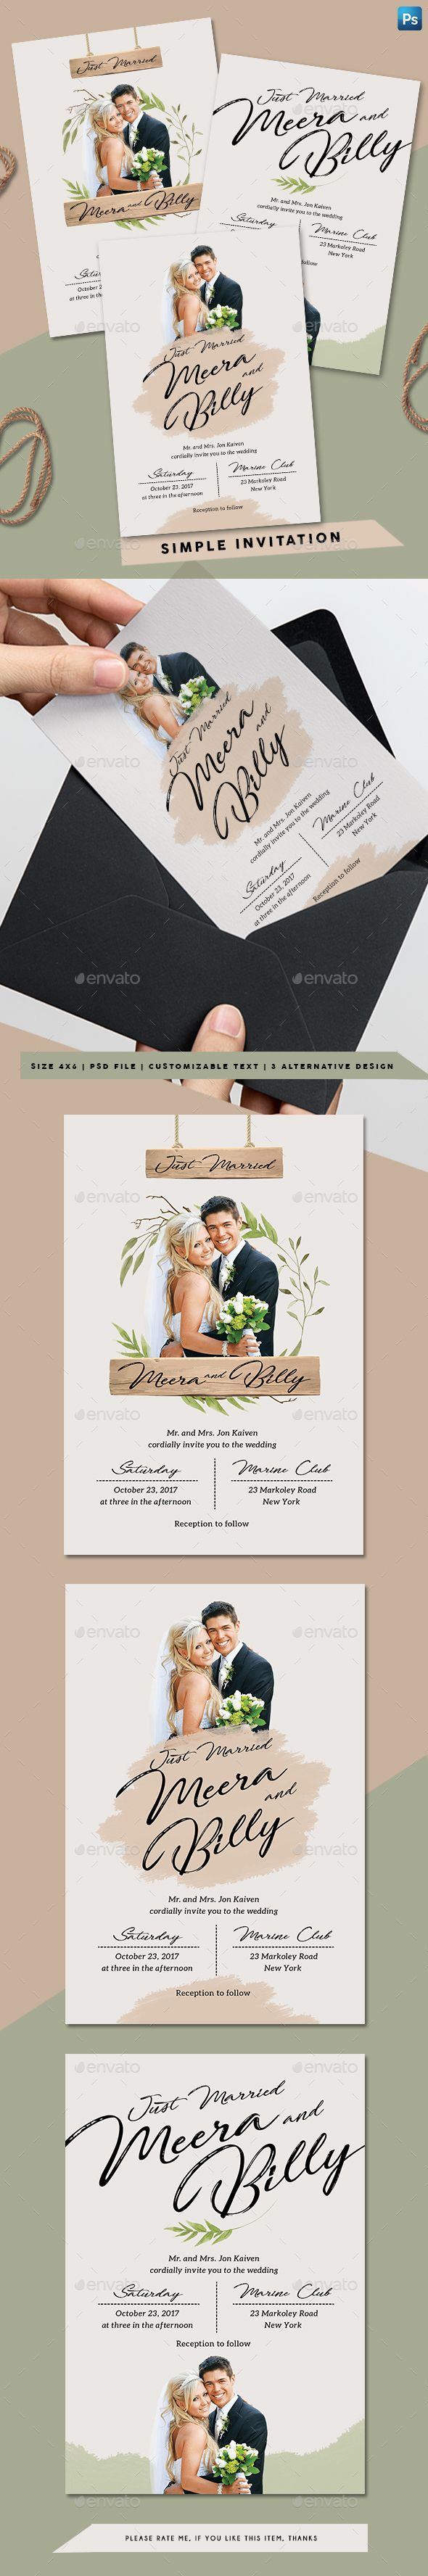 wedding invitations design template%0A Simple Invitation  Simple Wedding InvitationsInvitesInvitation  TemplatesInvitation